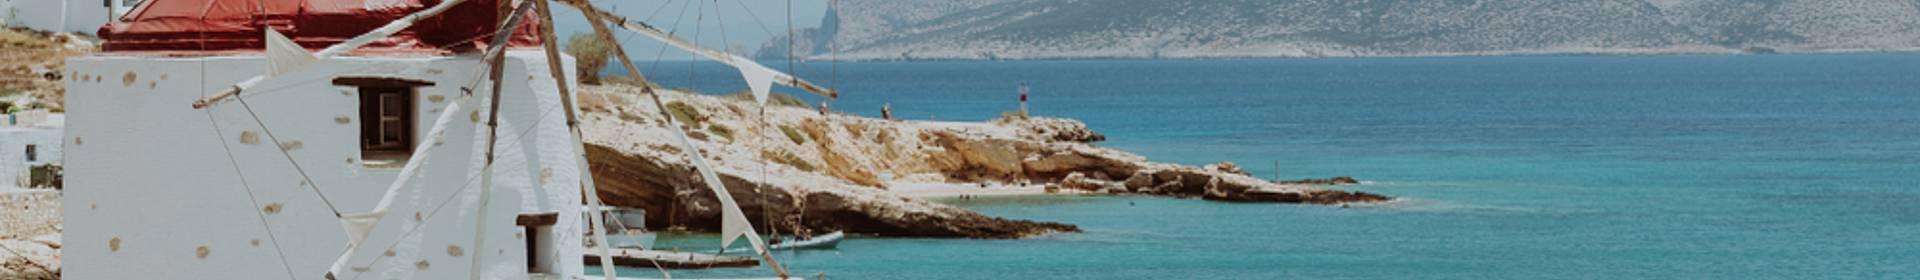 les Petites Cyclades